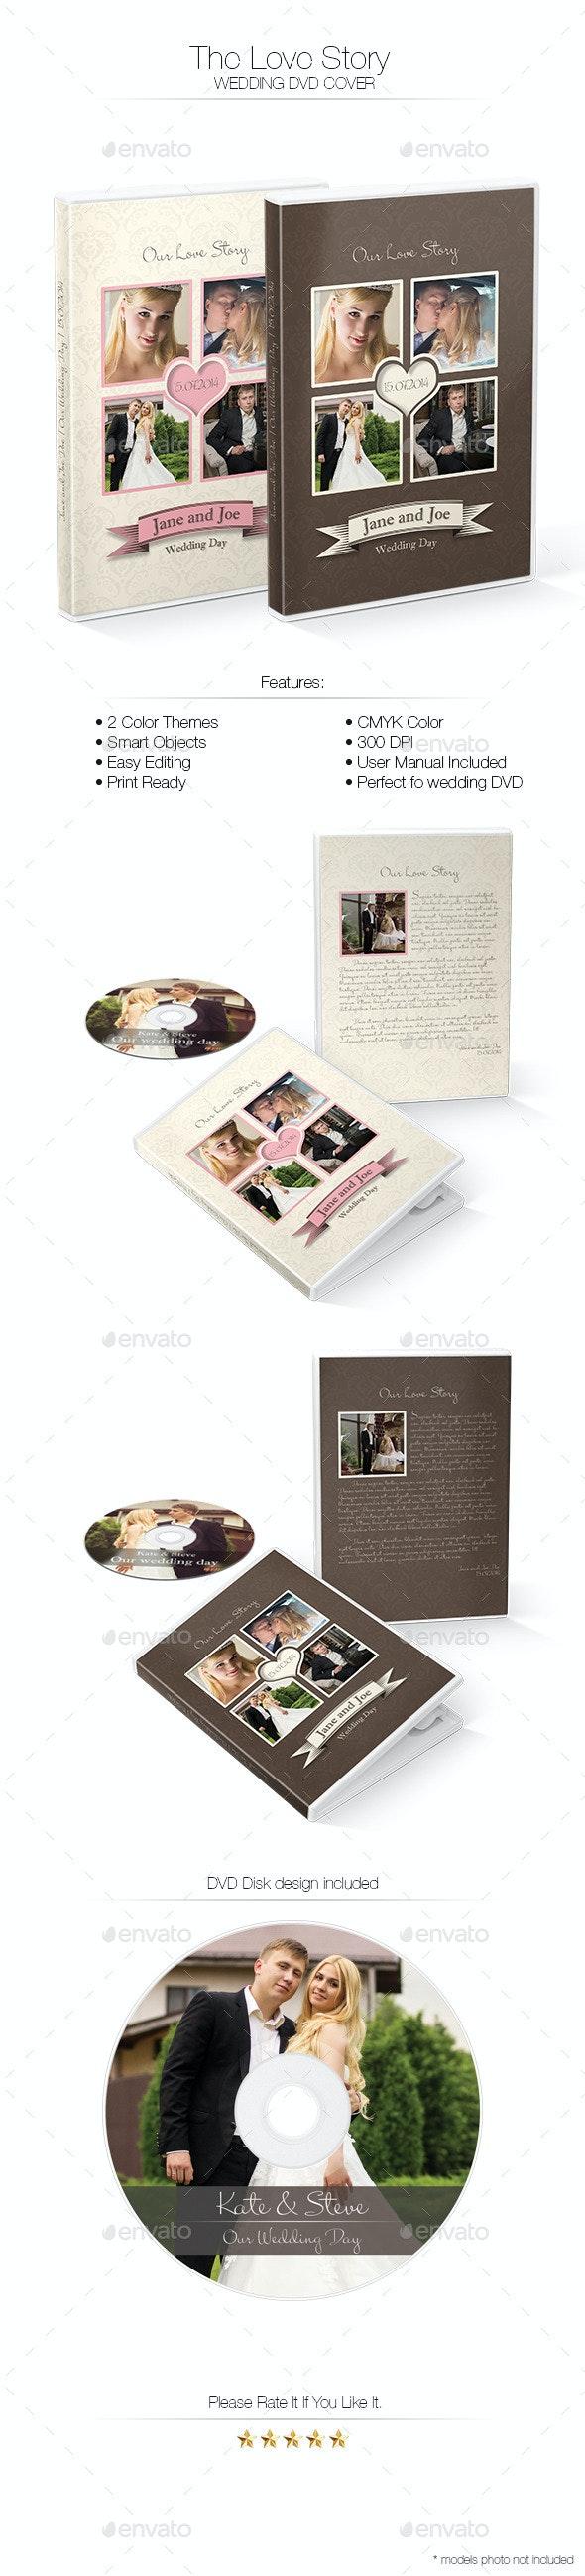 The Love Story DVD Cover - CD & DVD Artwork Print Templates